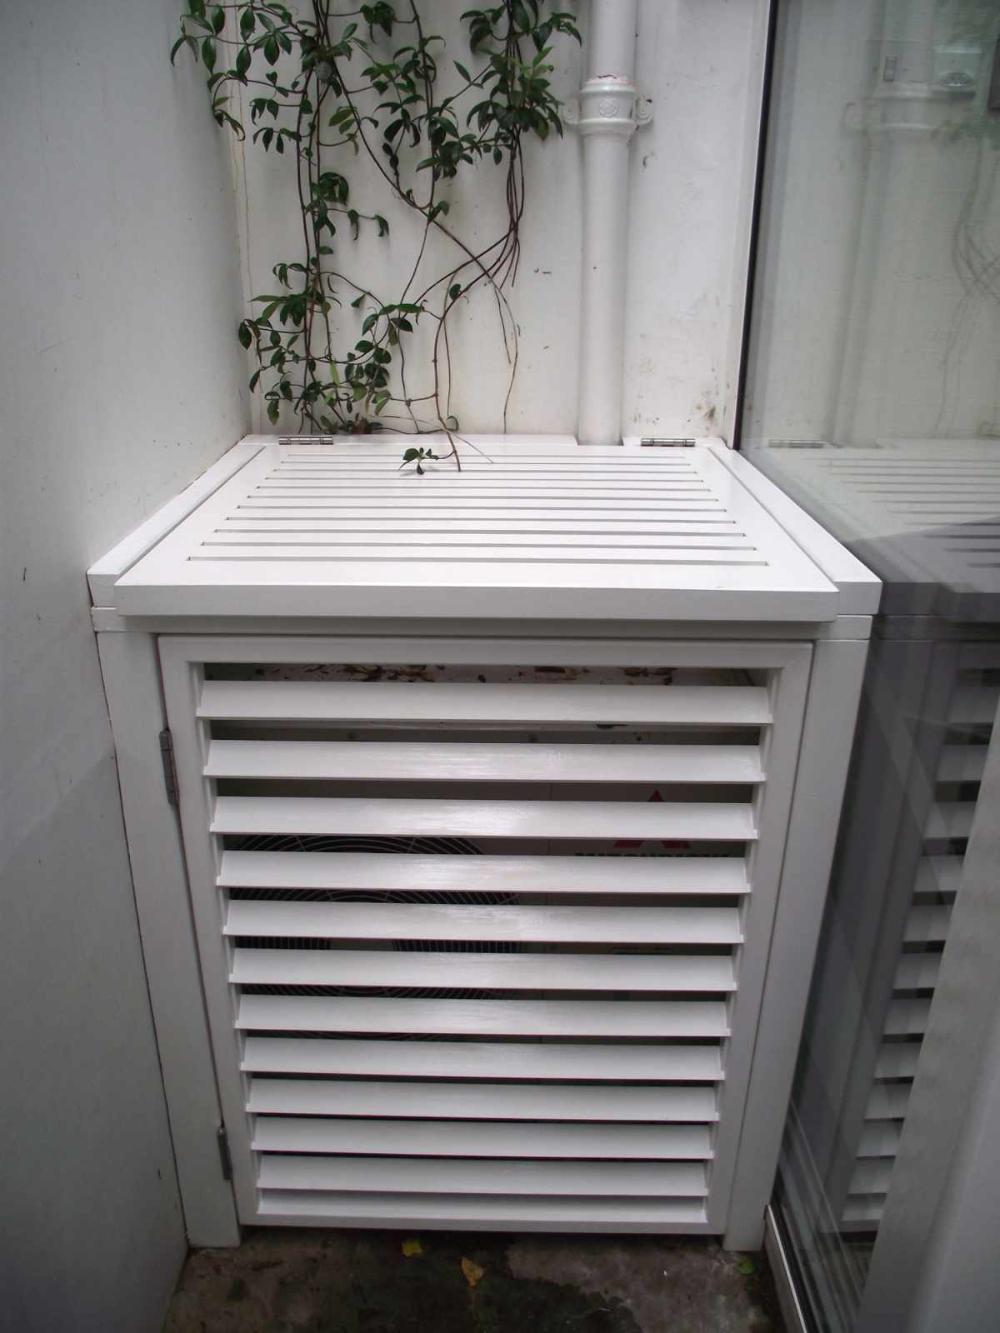 Air Conditioning Covers Essex UK The Garden Trellis